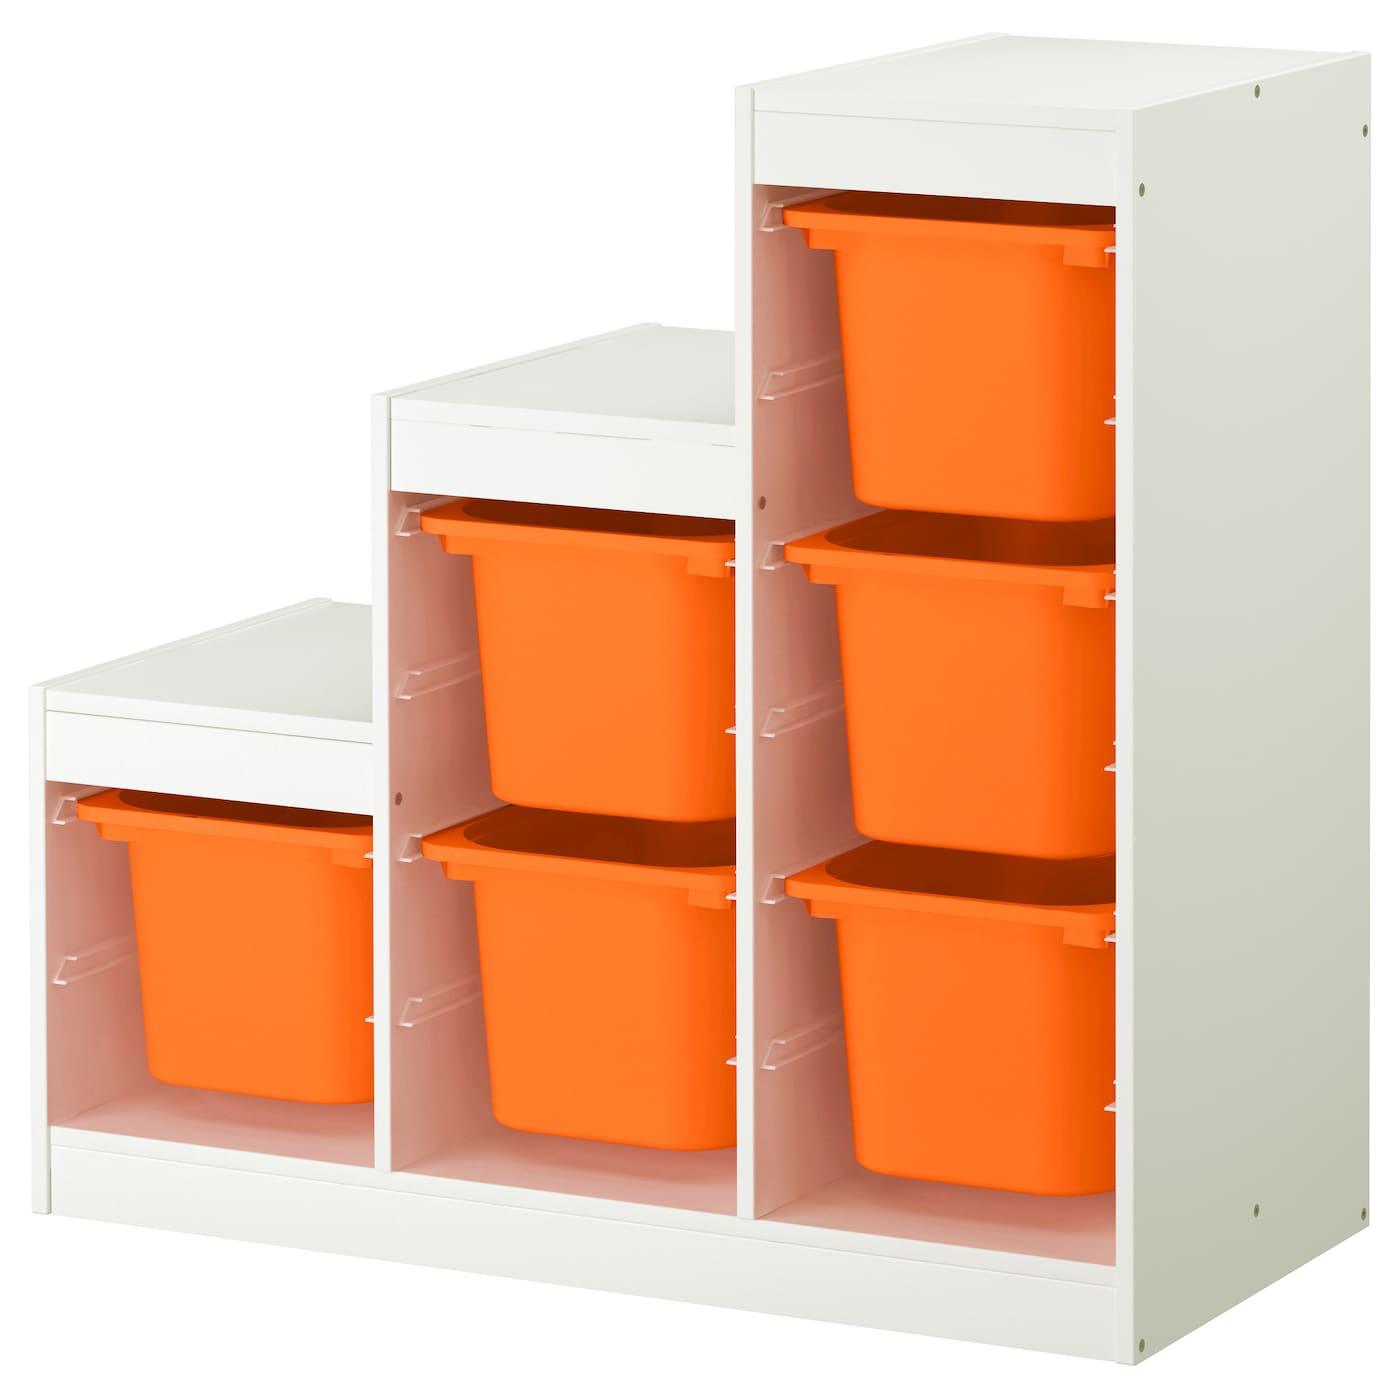 trofast opbergcombinatie wit oranje 99 x 44 x 94 cm ikea. Black Bedroom Furniture Sets. Home Design Ideas